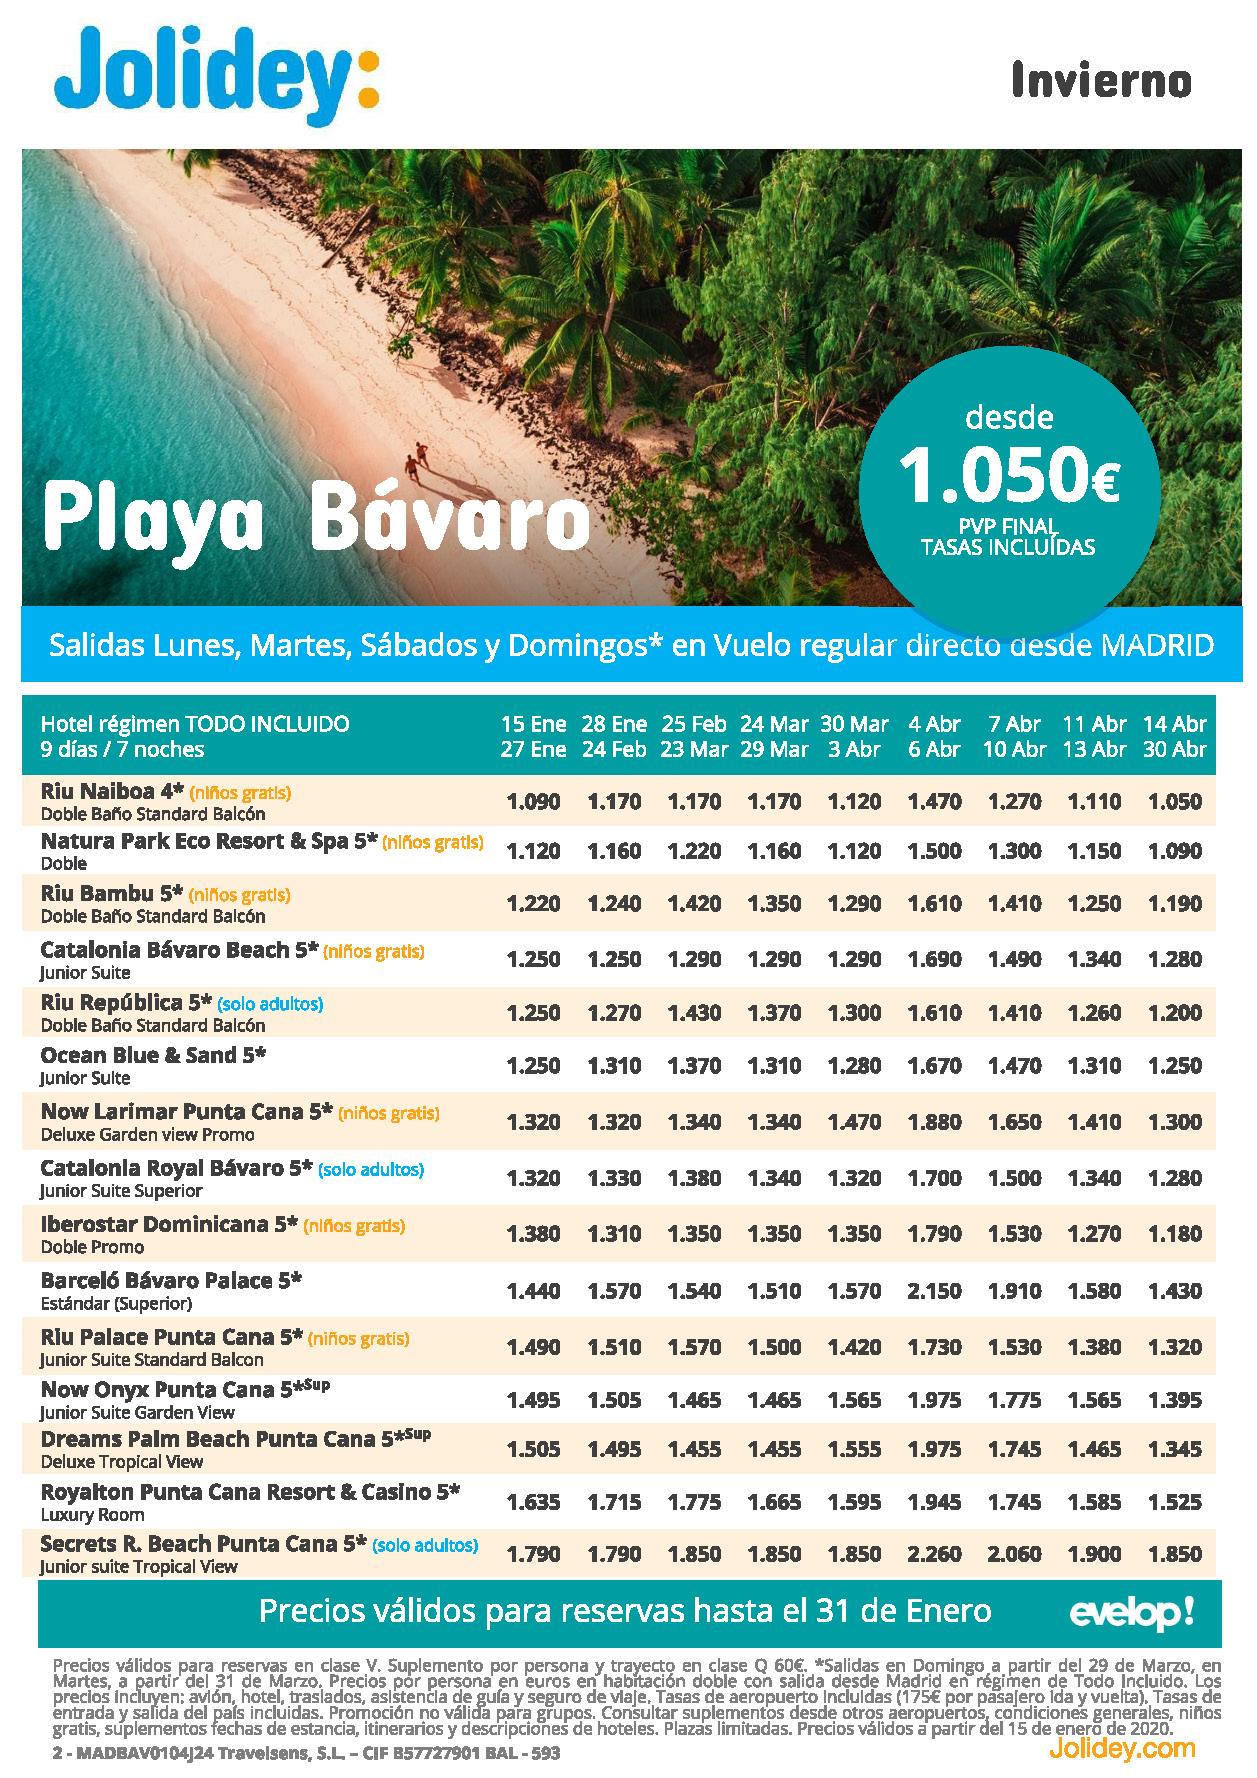 Ofertas Jolidey Punta Cana Invierno 2020